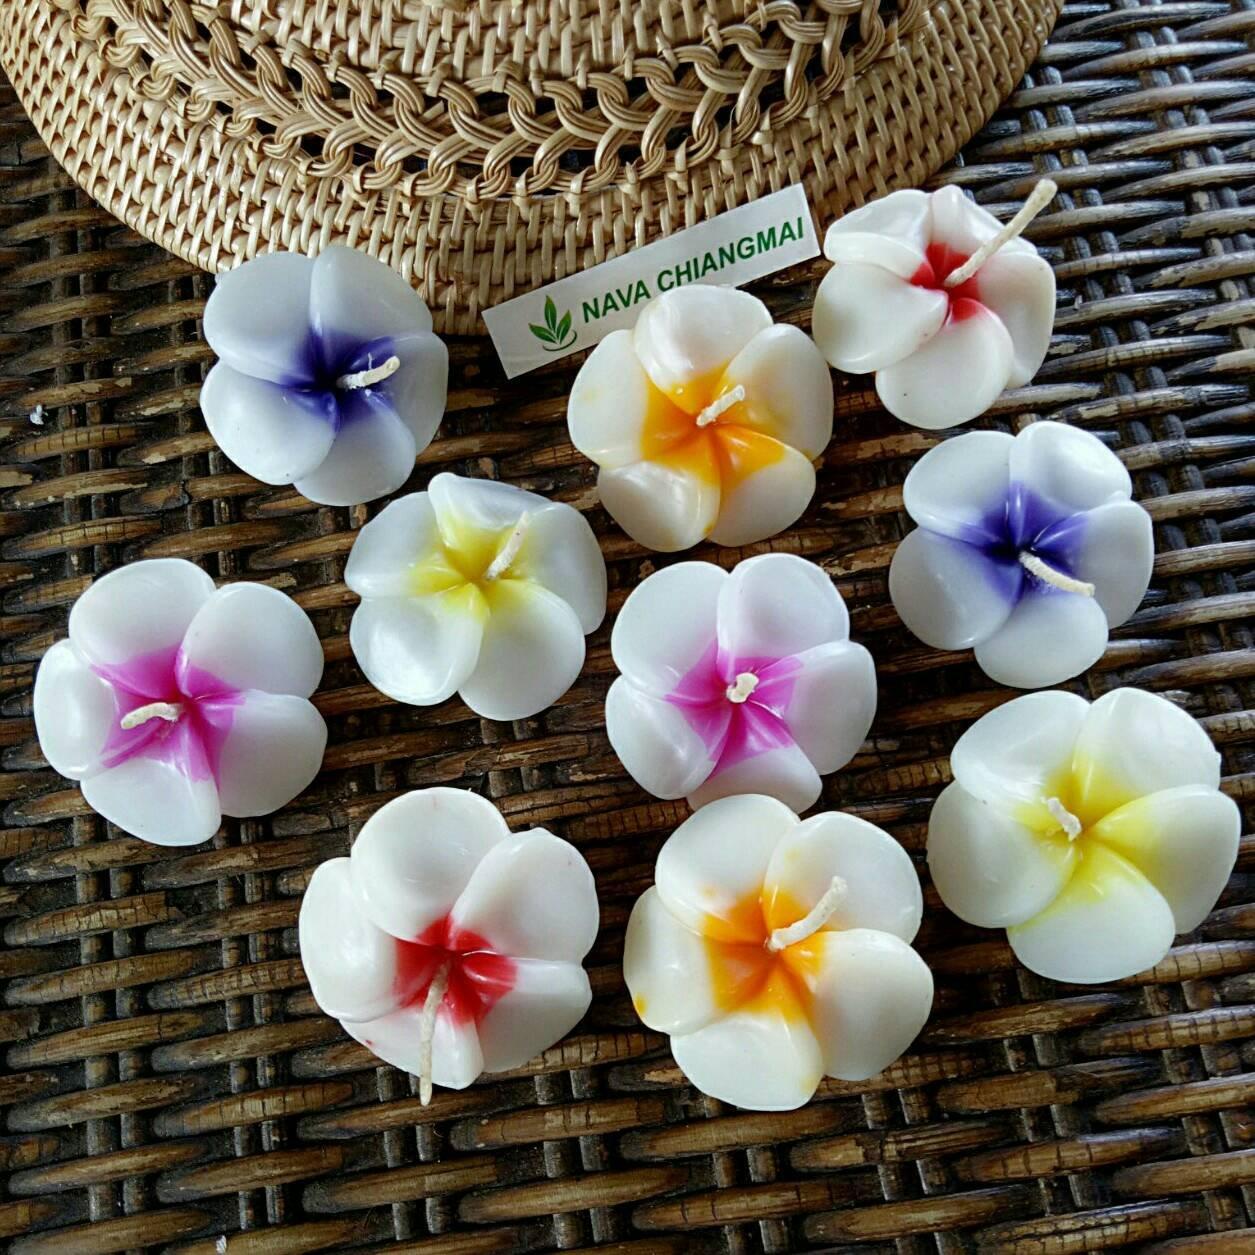 NAVA CHIANGMAI Plumeria Flower Floating Candles 10 pieces / 1 Set by NAVA CHIANGMAI (Image #3)